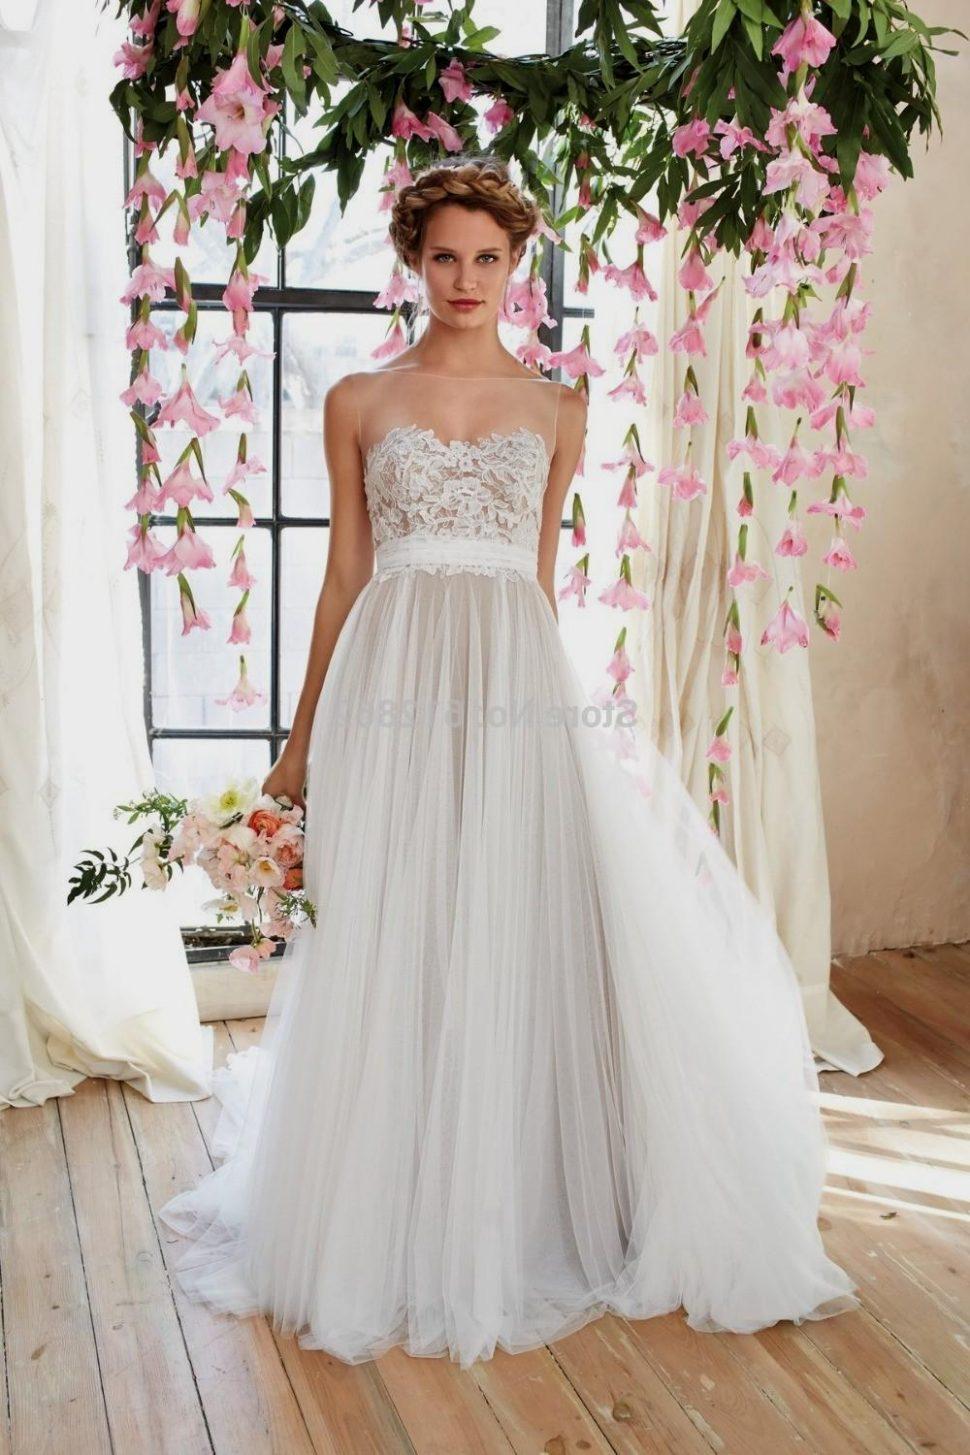 wedding dresses catalogues photo - 1